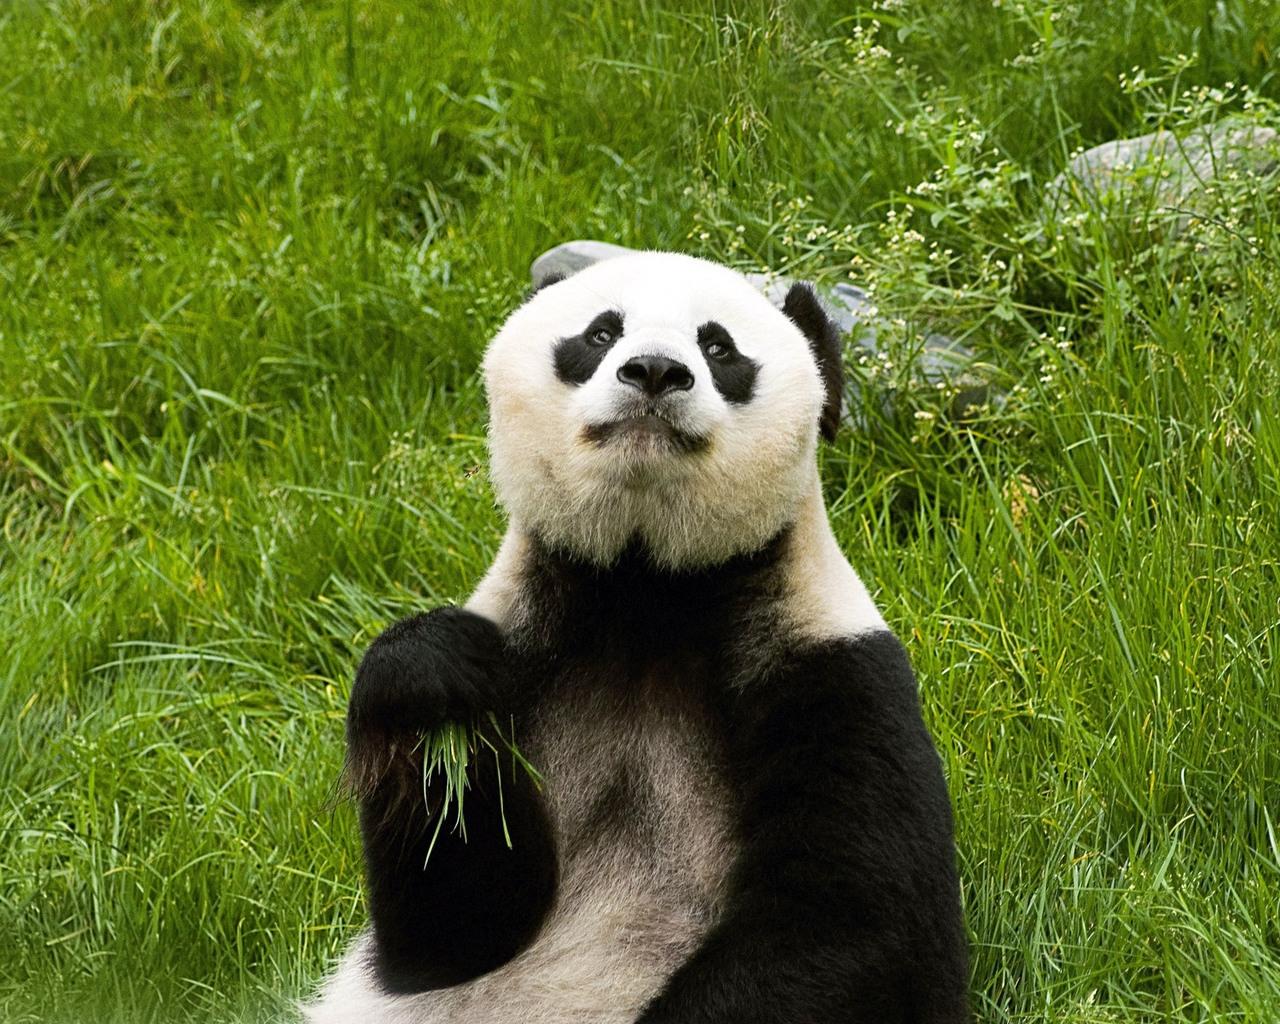 Panda Beautiful Cool Hd Wallpaper 2013 | Beautiful And ...